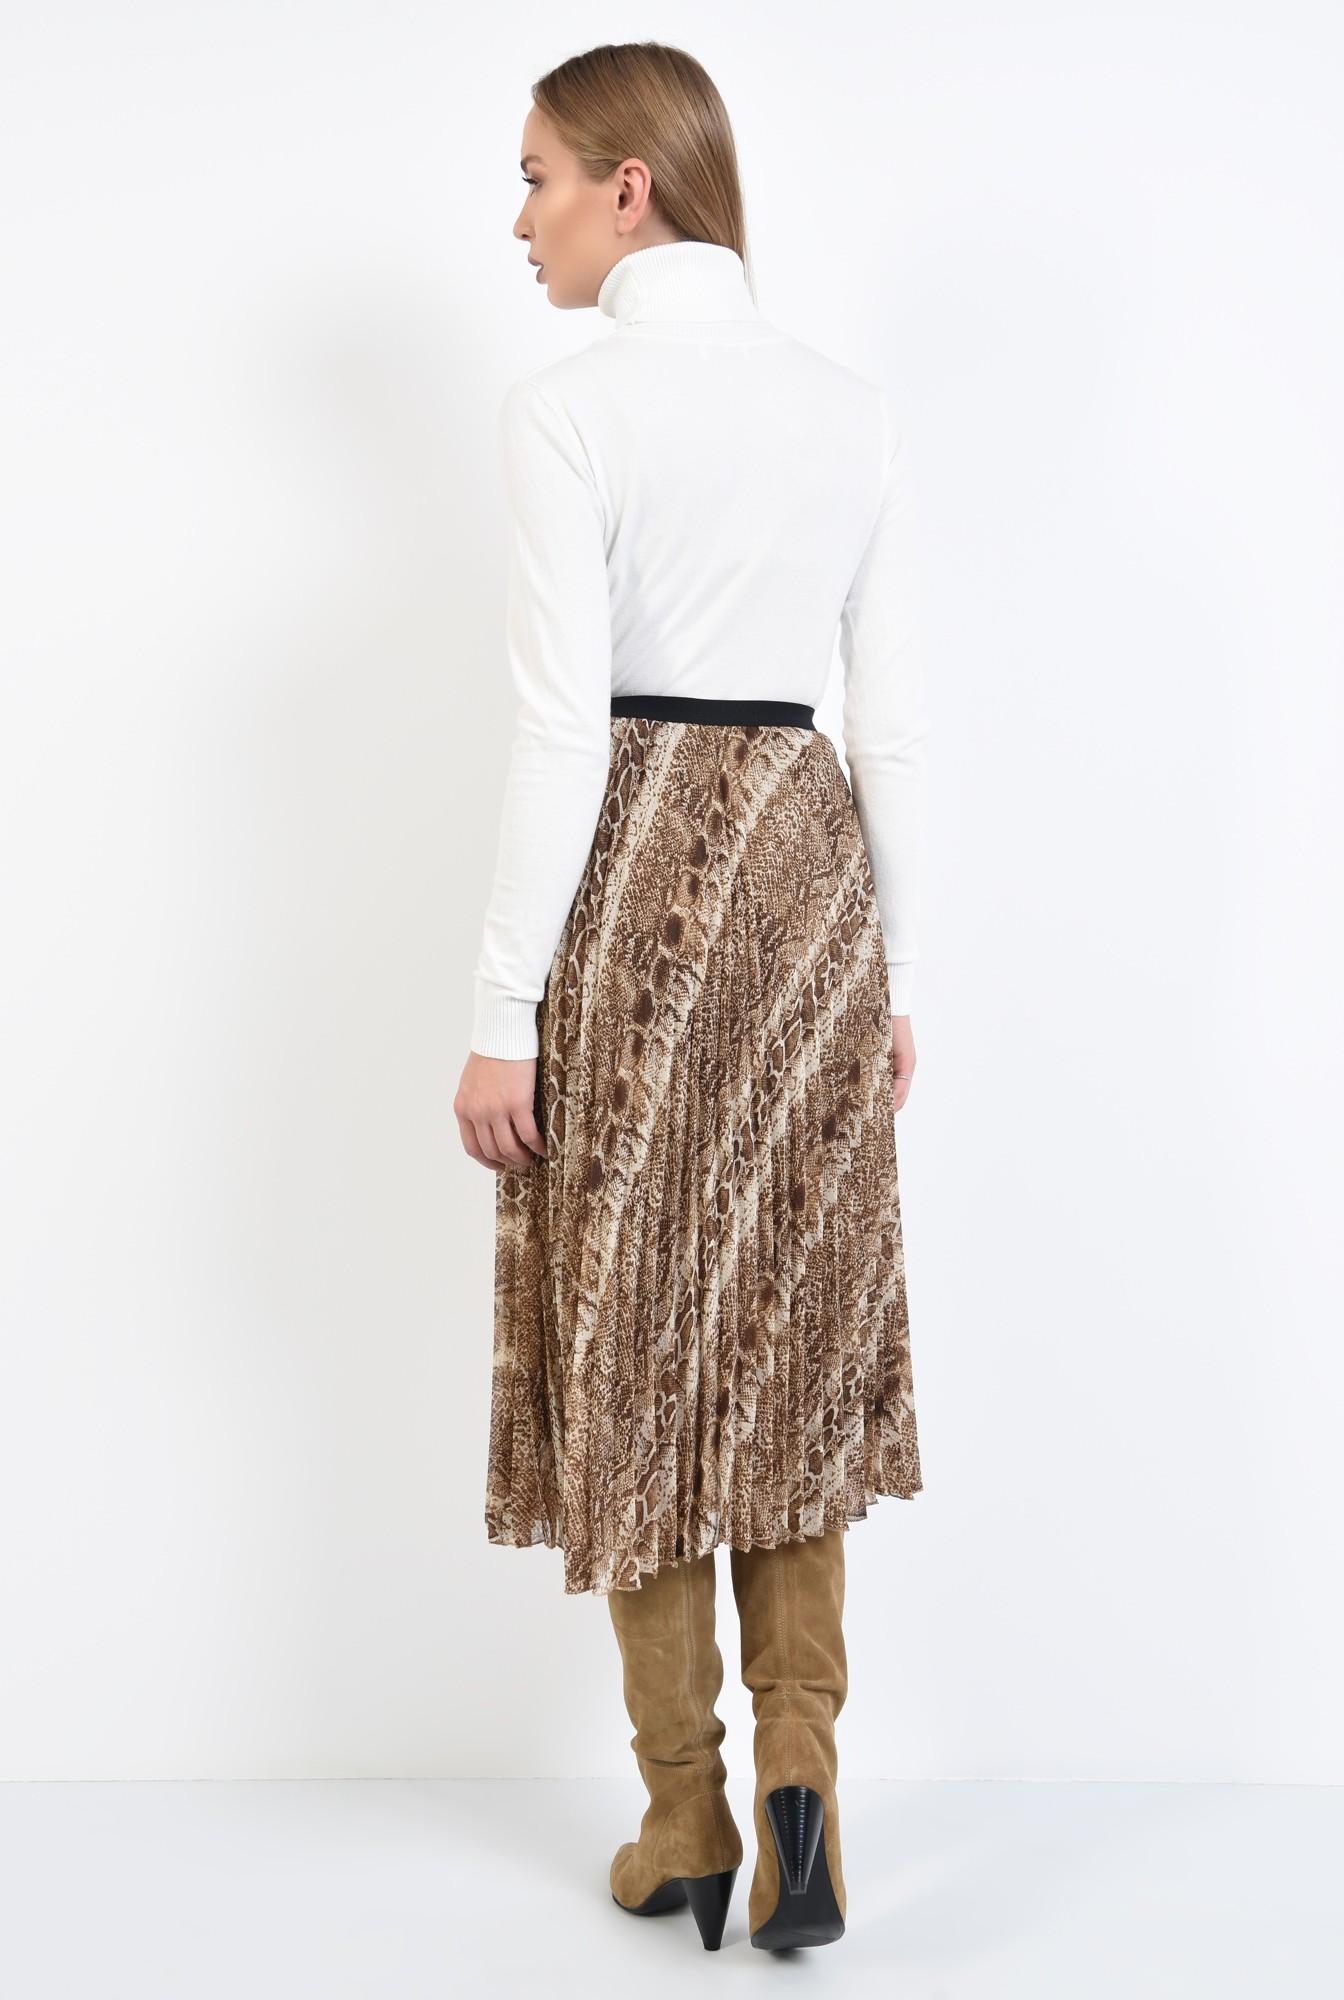 1 - pulover tip maleta, alb, borduri reiate, guler inalt, bluza tricotata